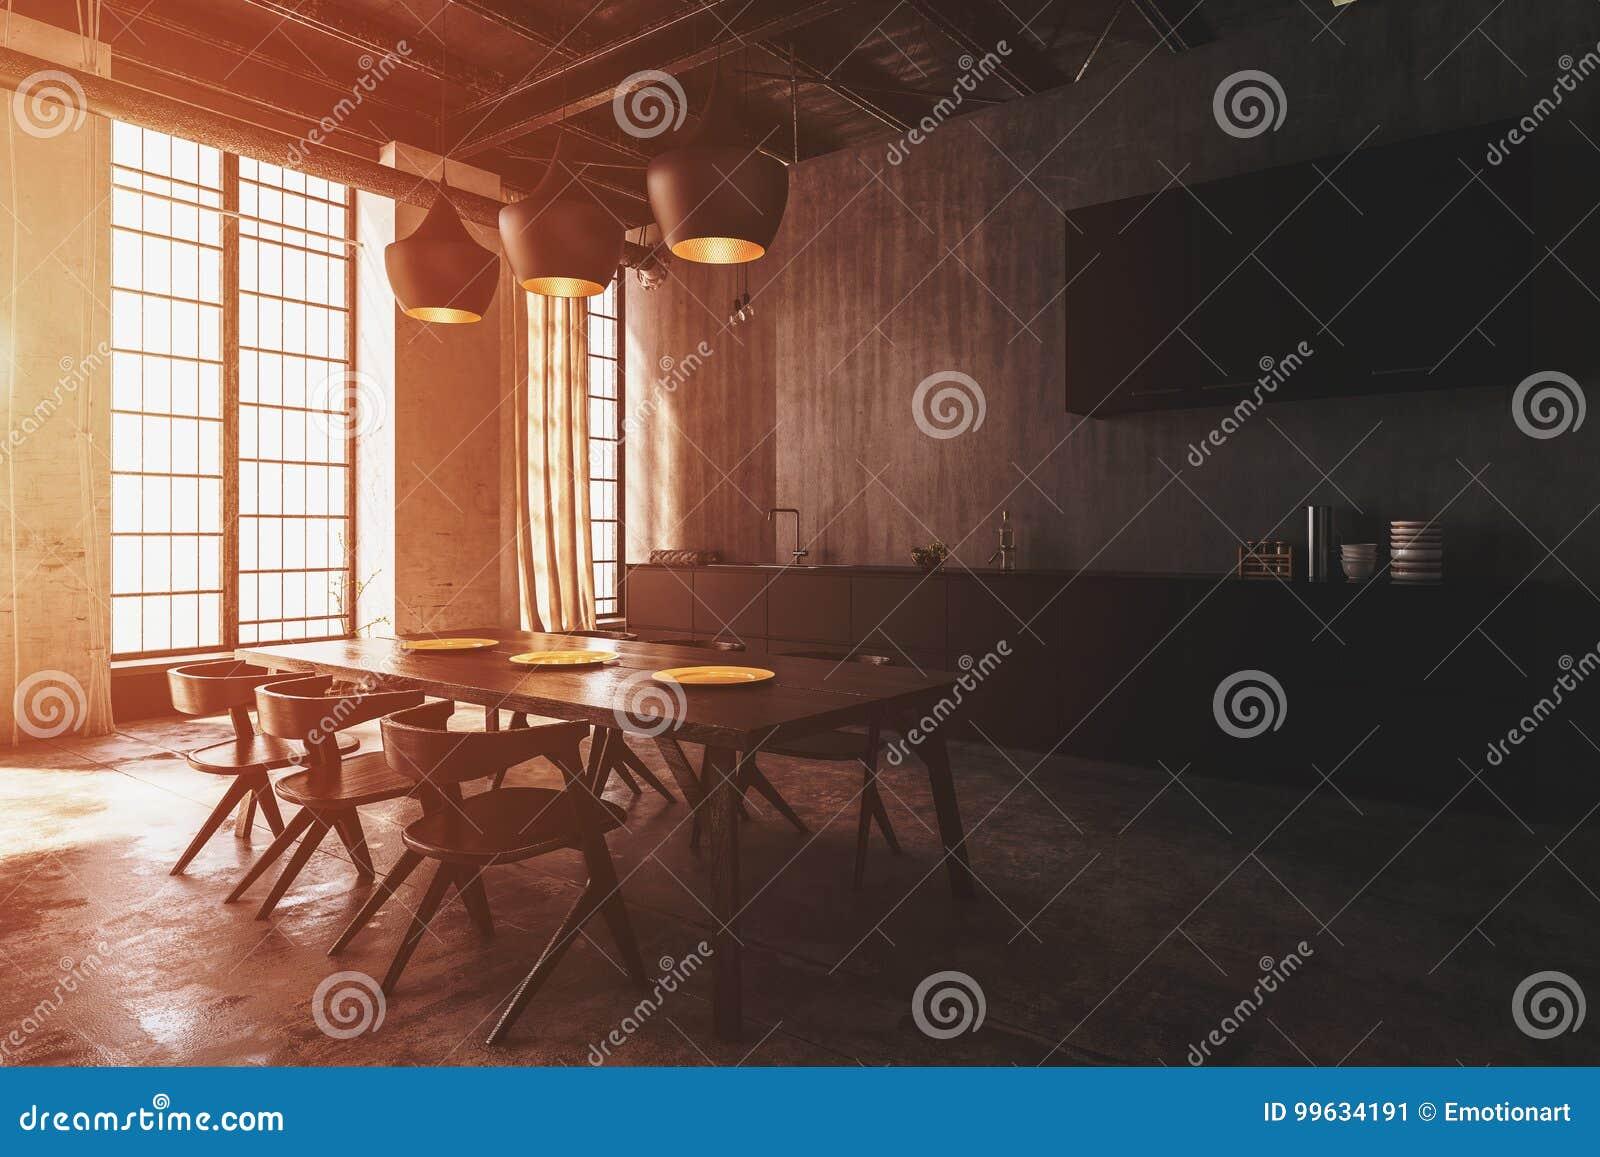 Plafoniera Per Sala Da Pranzo : Interno moderno della sala da pranzo con le plafoniere